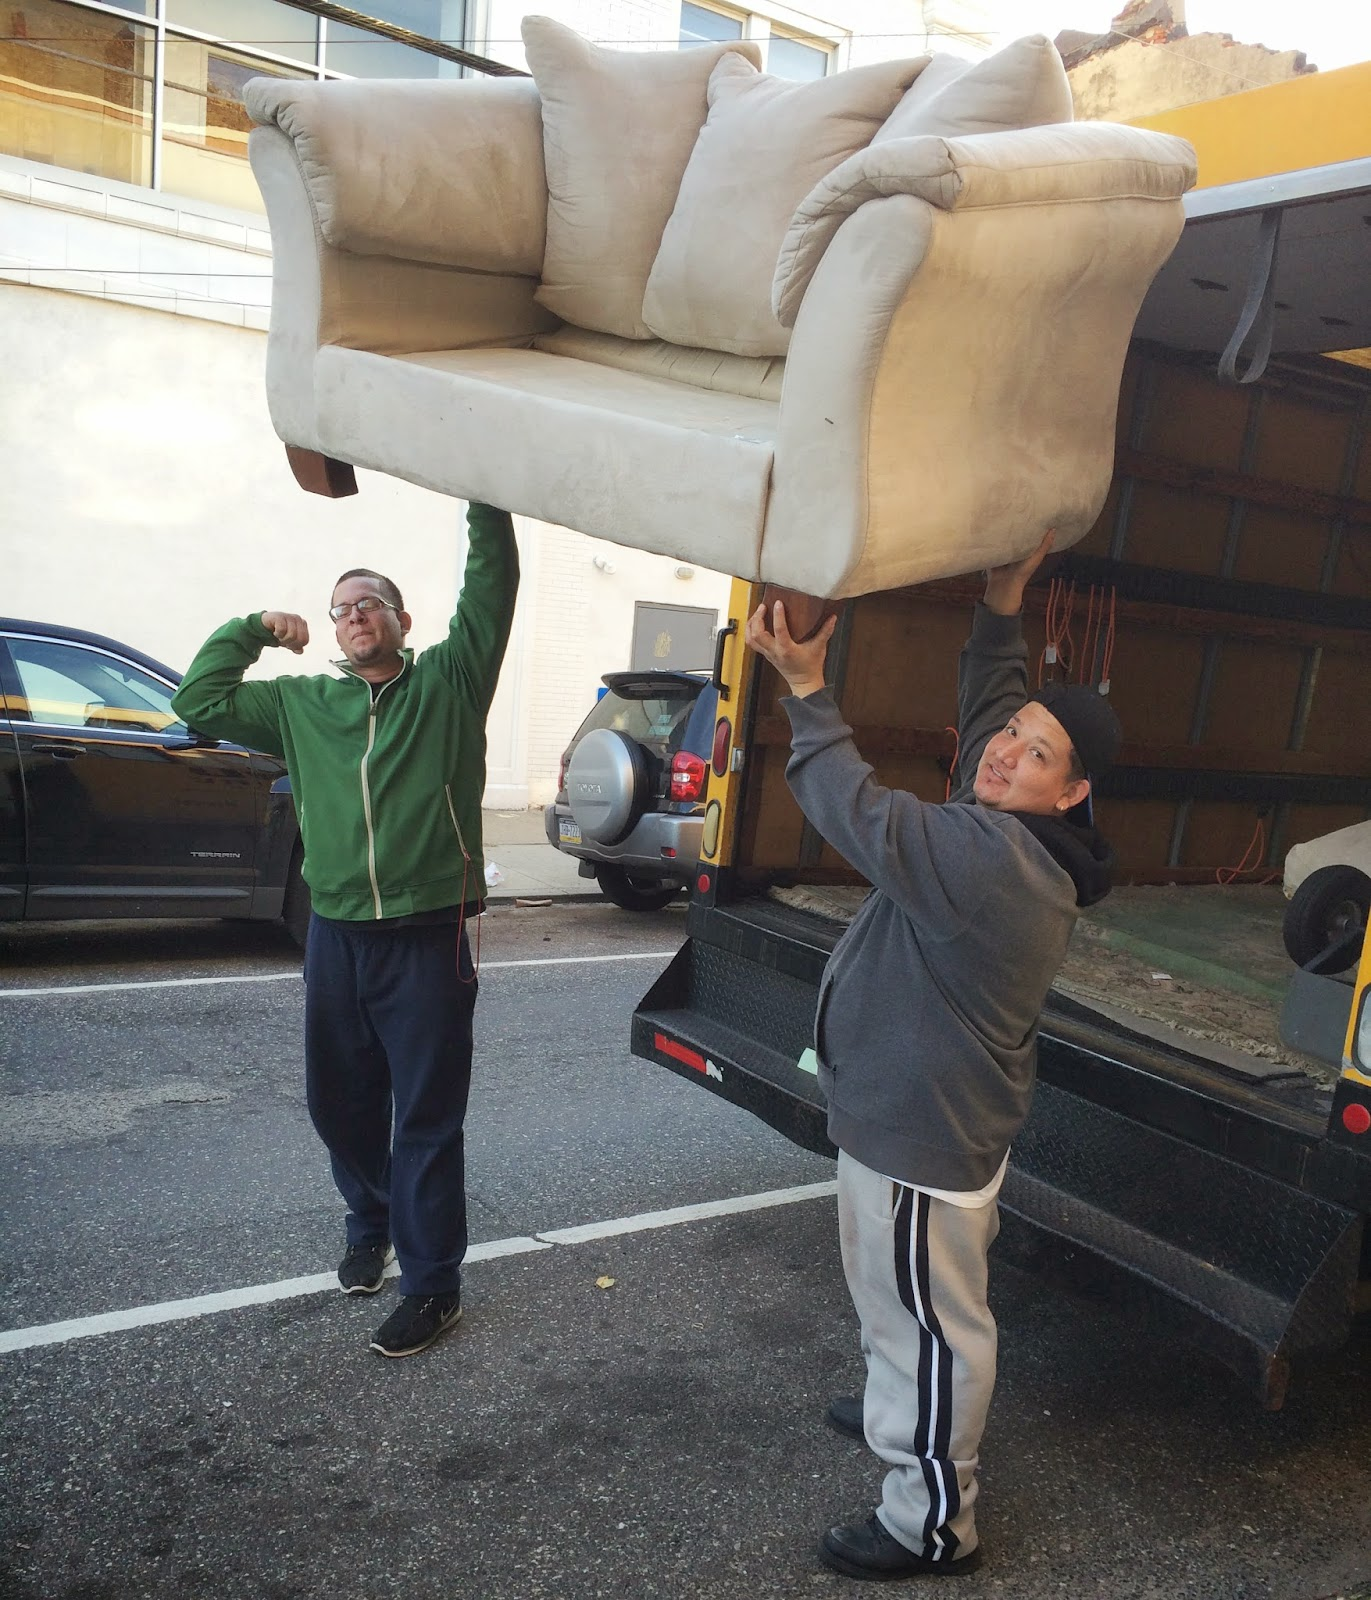 charity sofa pick up bed amazon uhuru furniture and collectibles donate